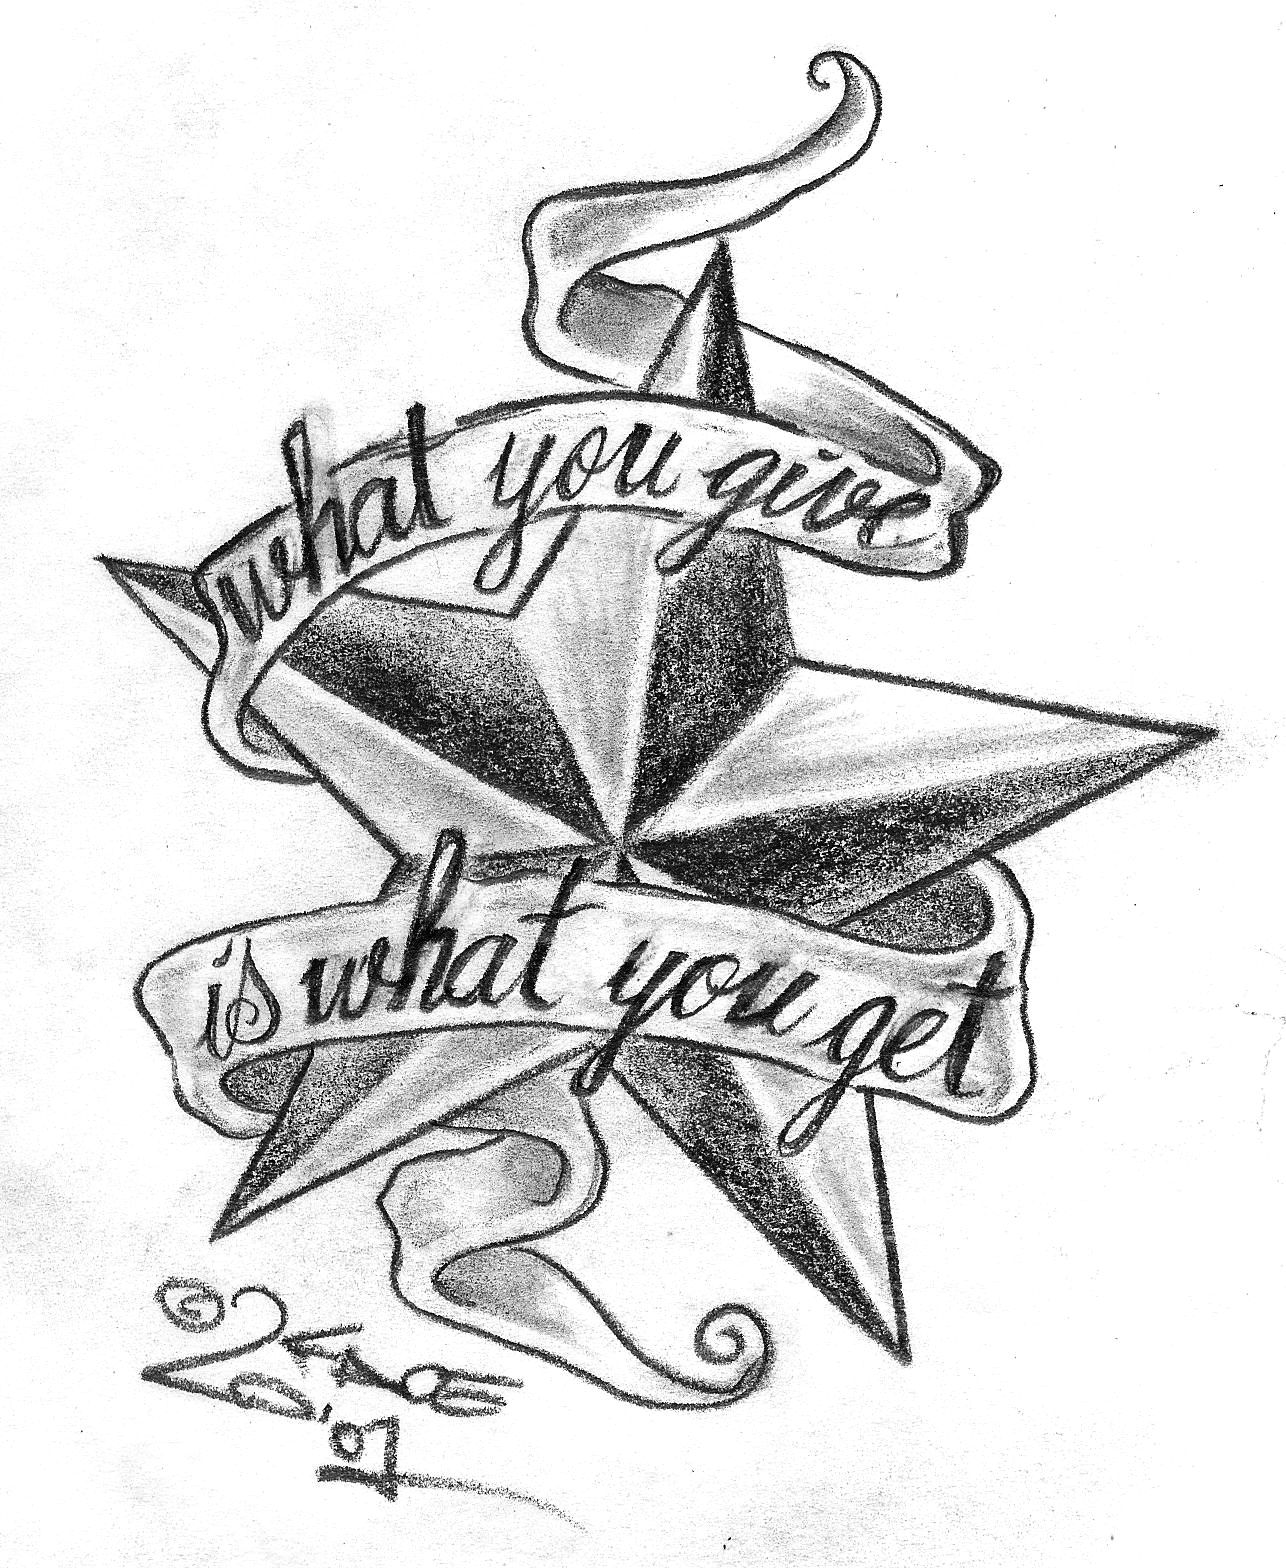 Audrey Hepburn Wall Mural Tattoo Lettering Stencils